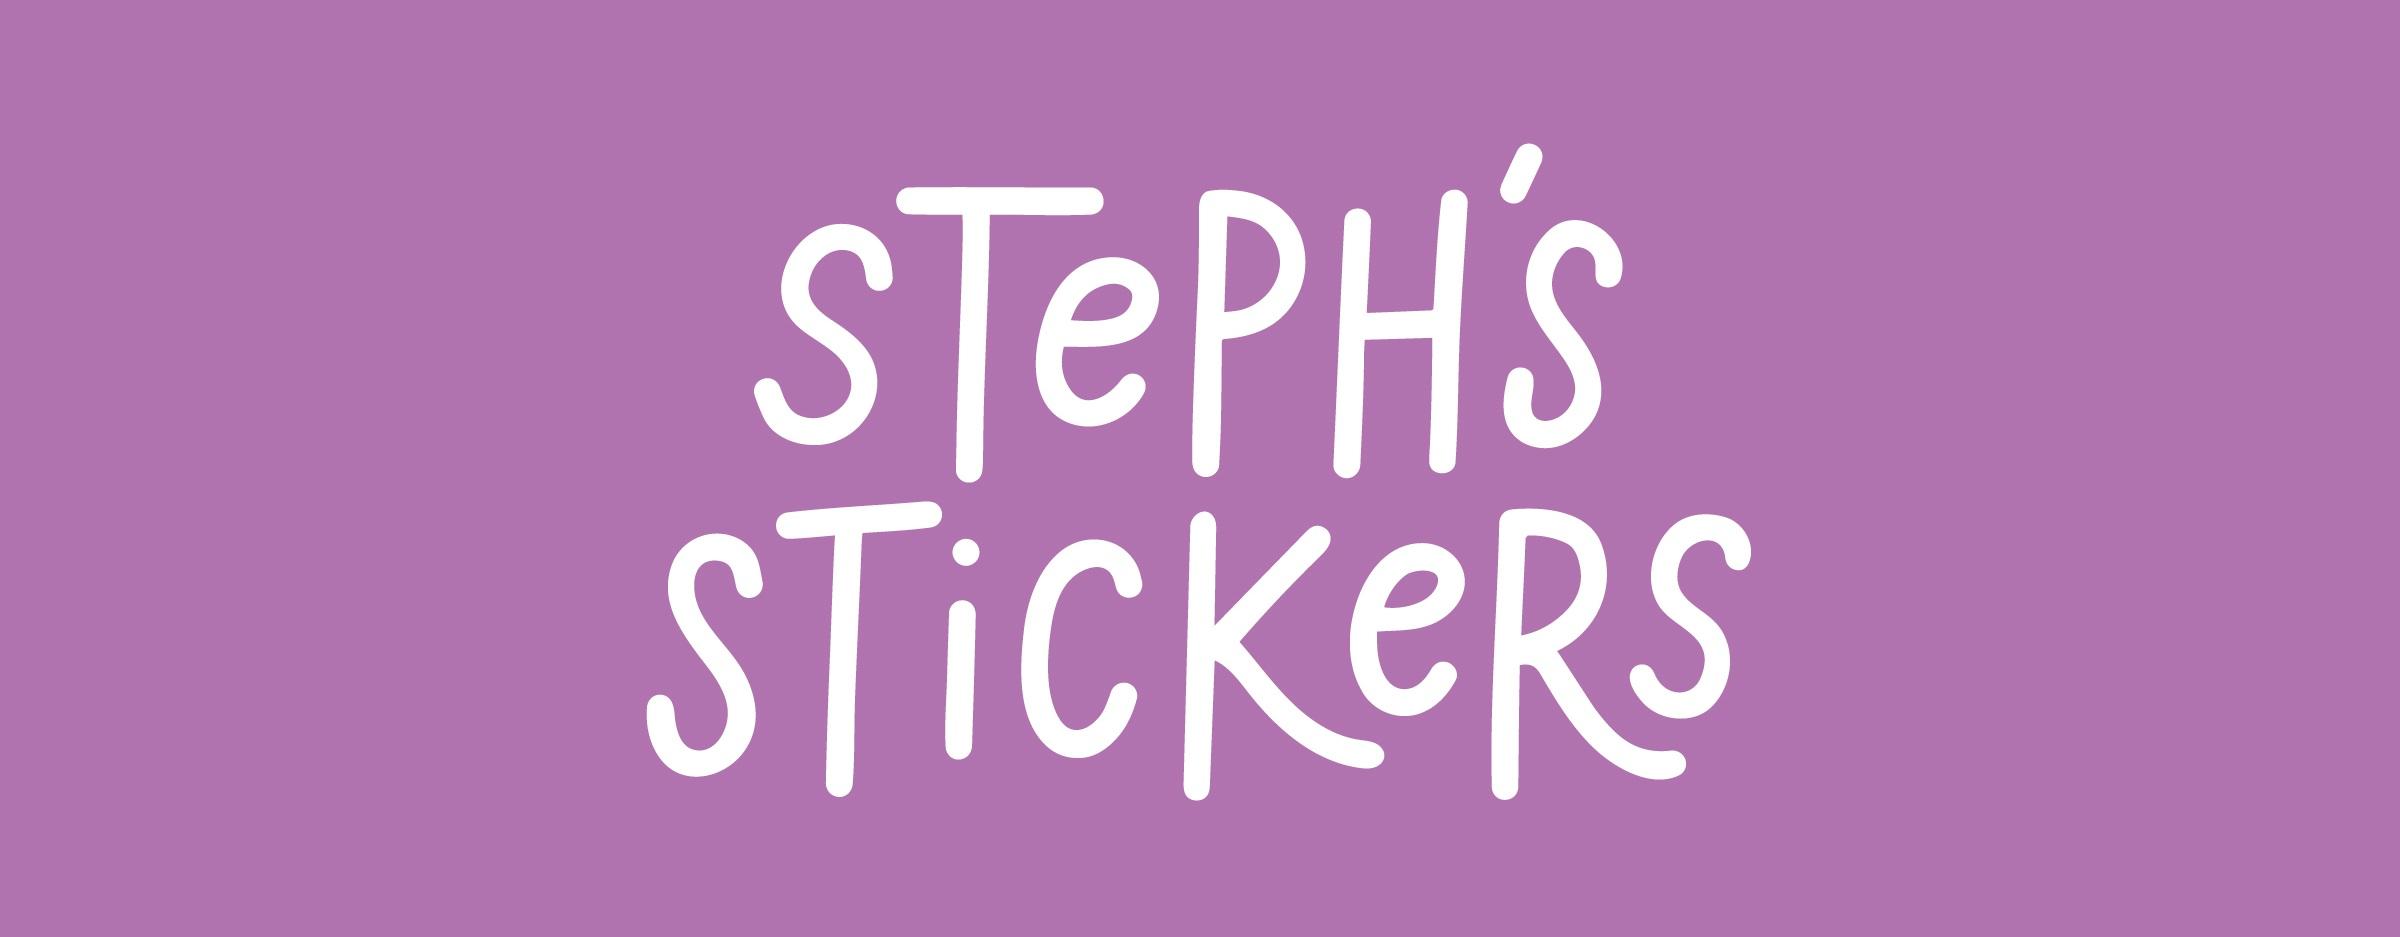 Stephs Stickers Logo Design